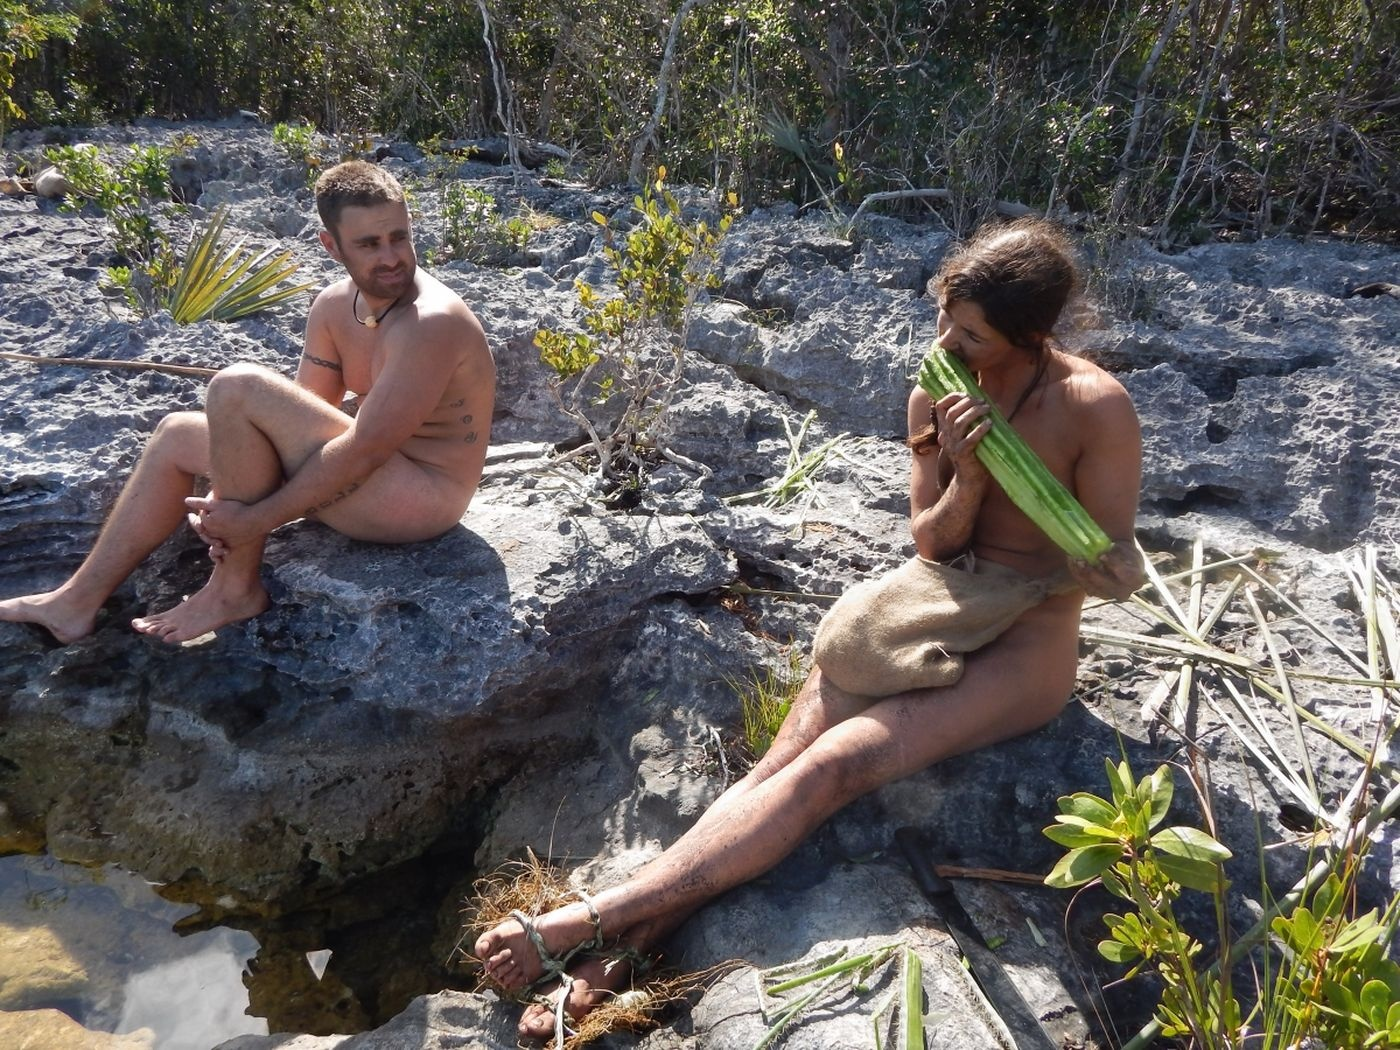 Lowrider femals nude